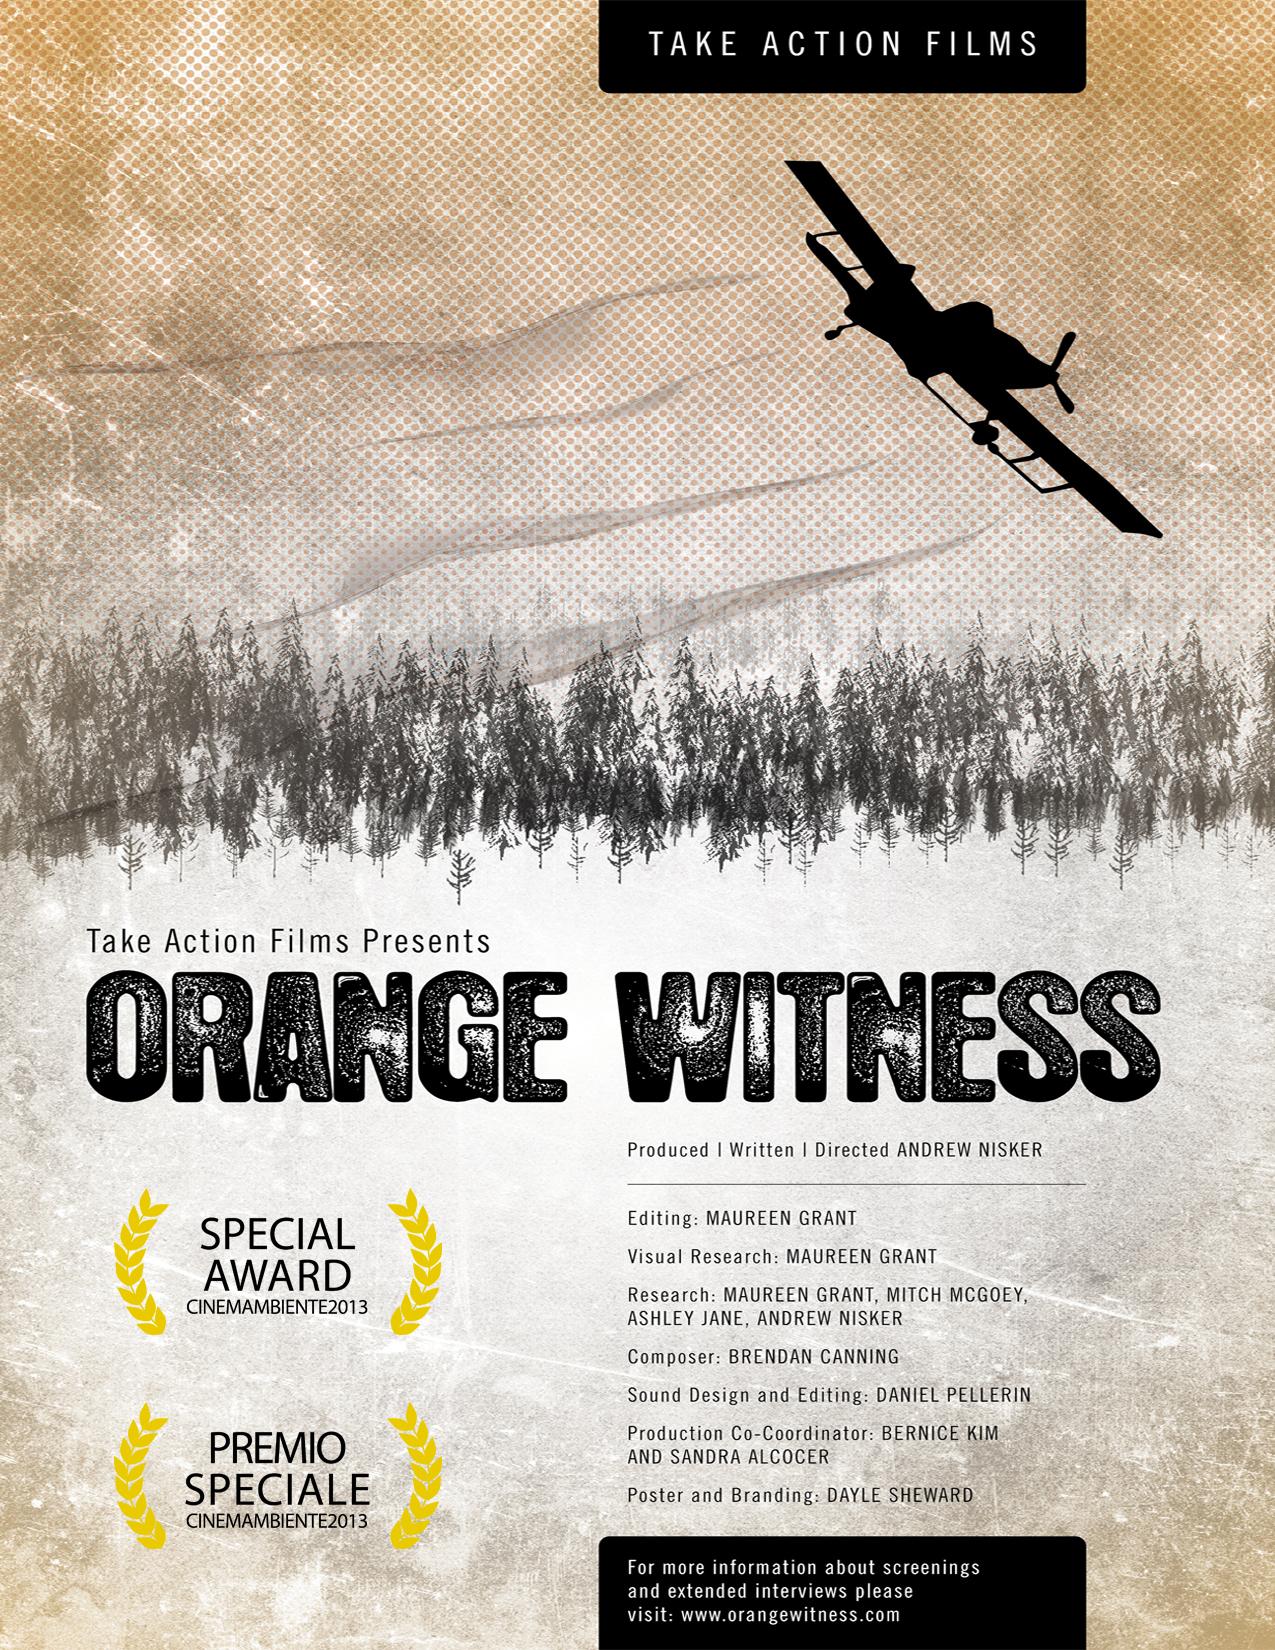 OrangeWitness-Poster-HQ.jpg